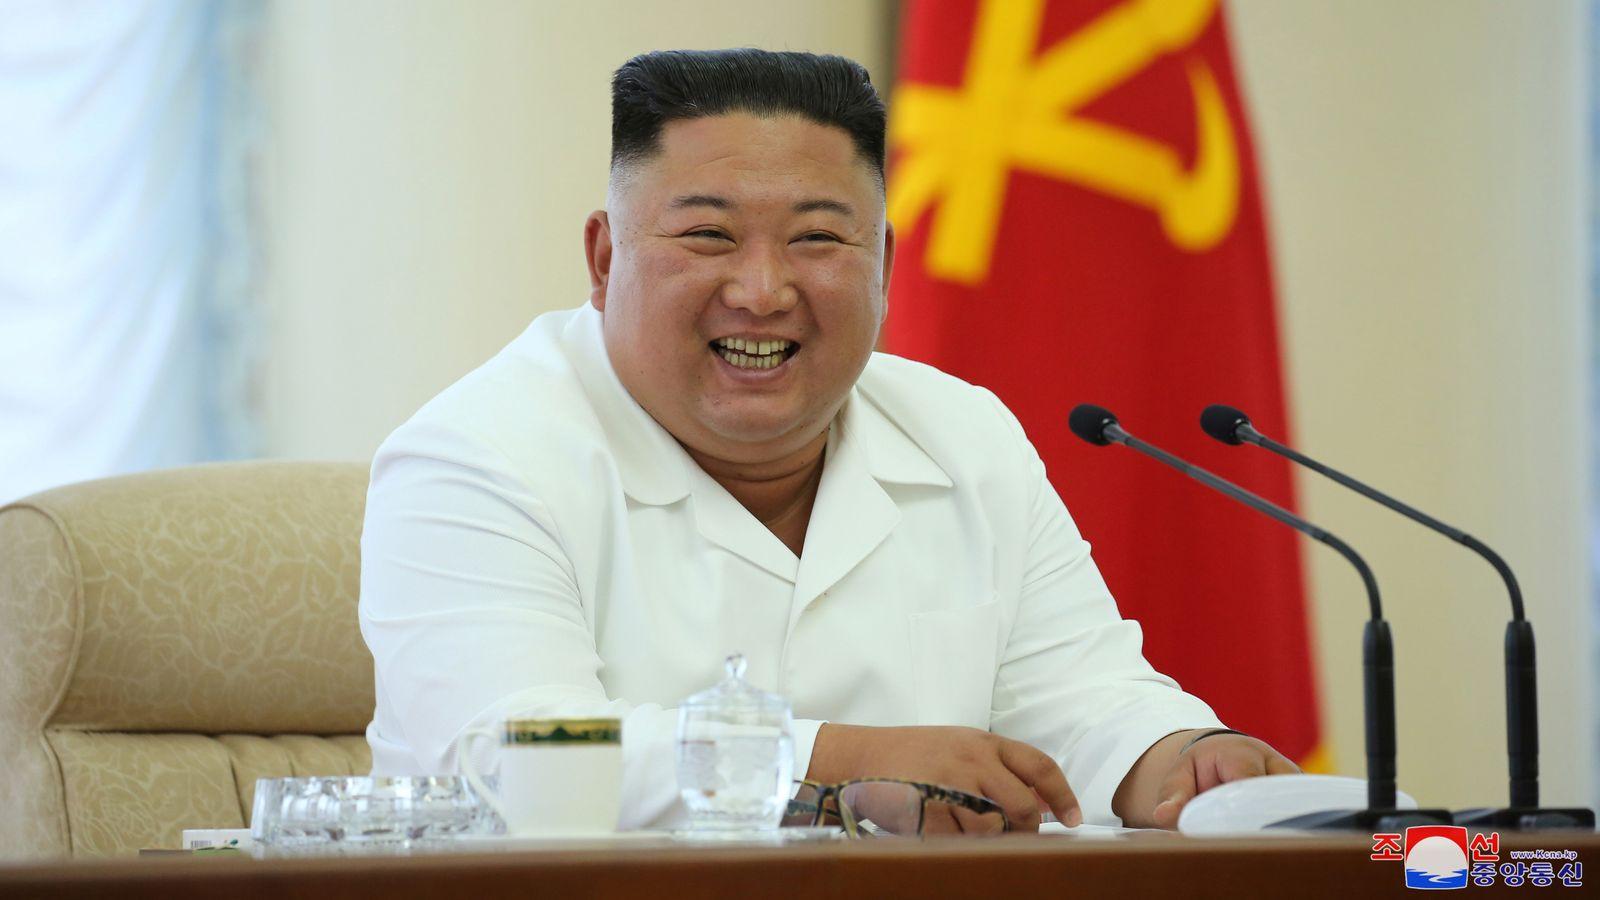 Coronavirus No Mention Of Covid 19 As Kim Jong Un Chairs Politburo Meeting World News Sky News